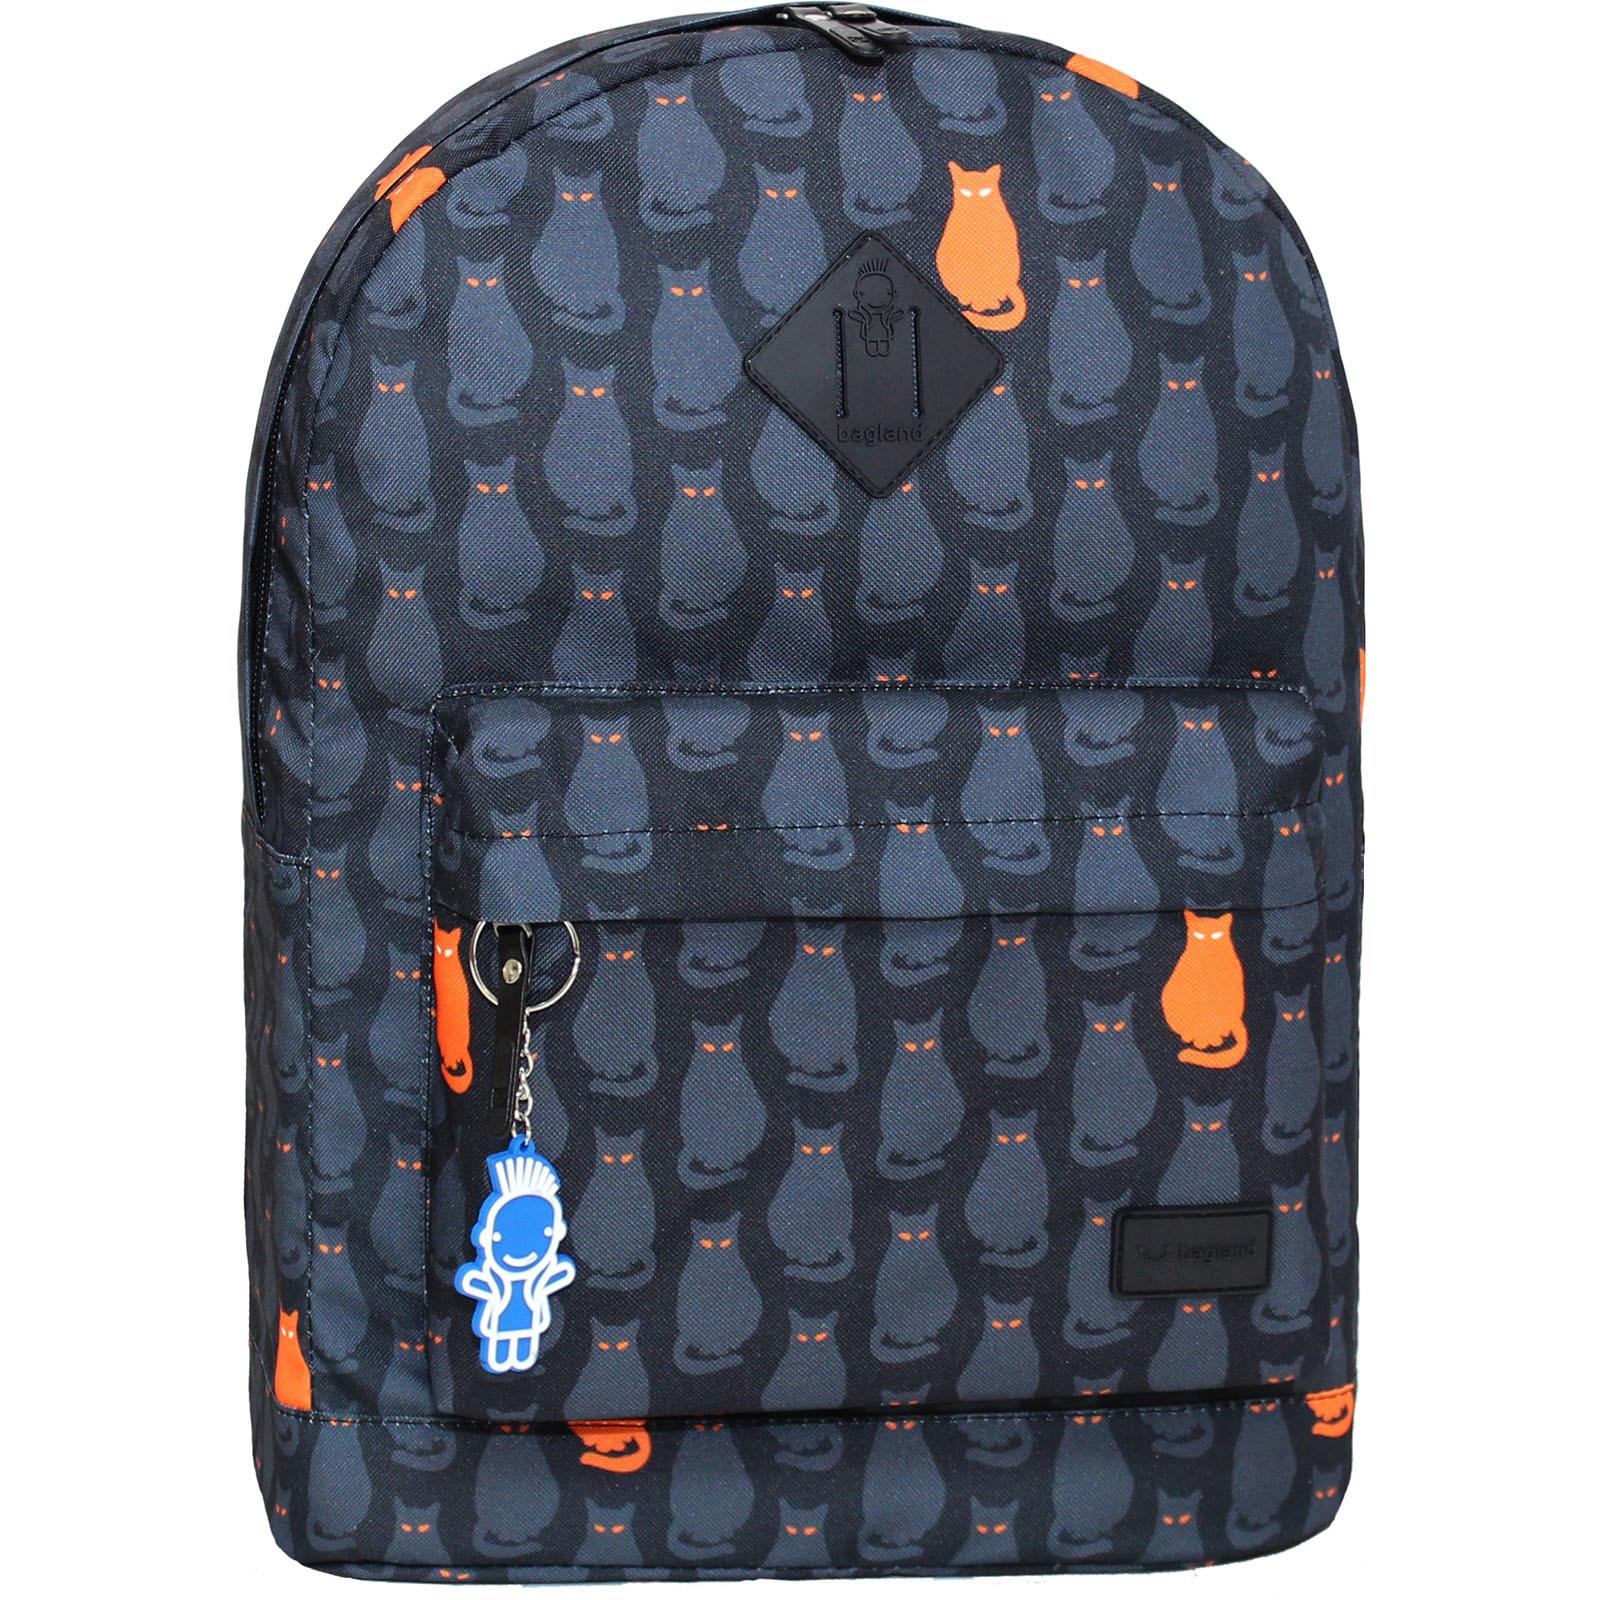 Городские рюкзаки Рюкзак Bagland Молодежный (дизайн) 17 л. сублимация 193 (00533664) Без_имени-5_193.jpg